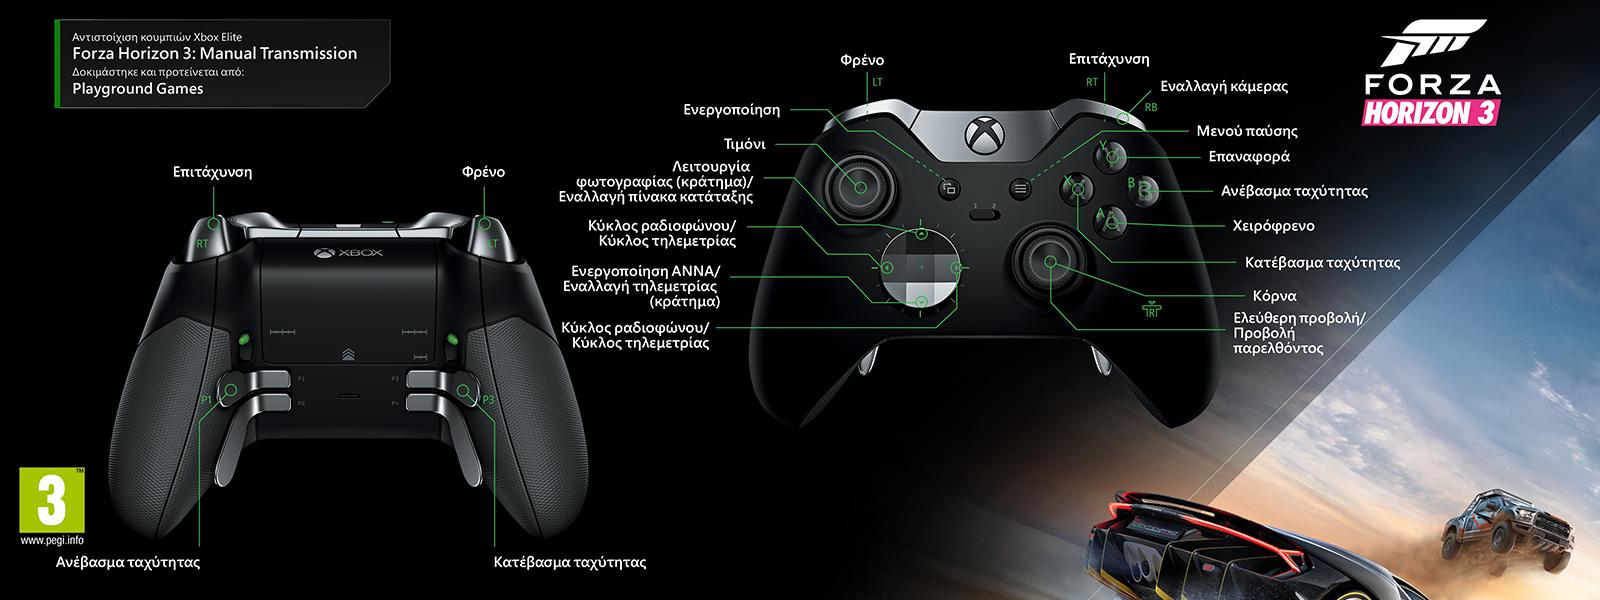 Forza Horizon 3 – Χαρτογράφηση Manual Transmission Elite